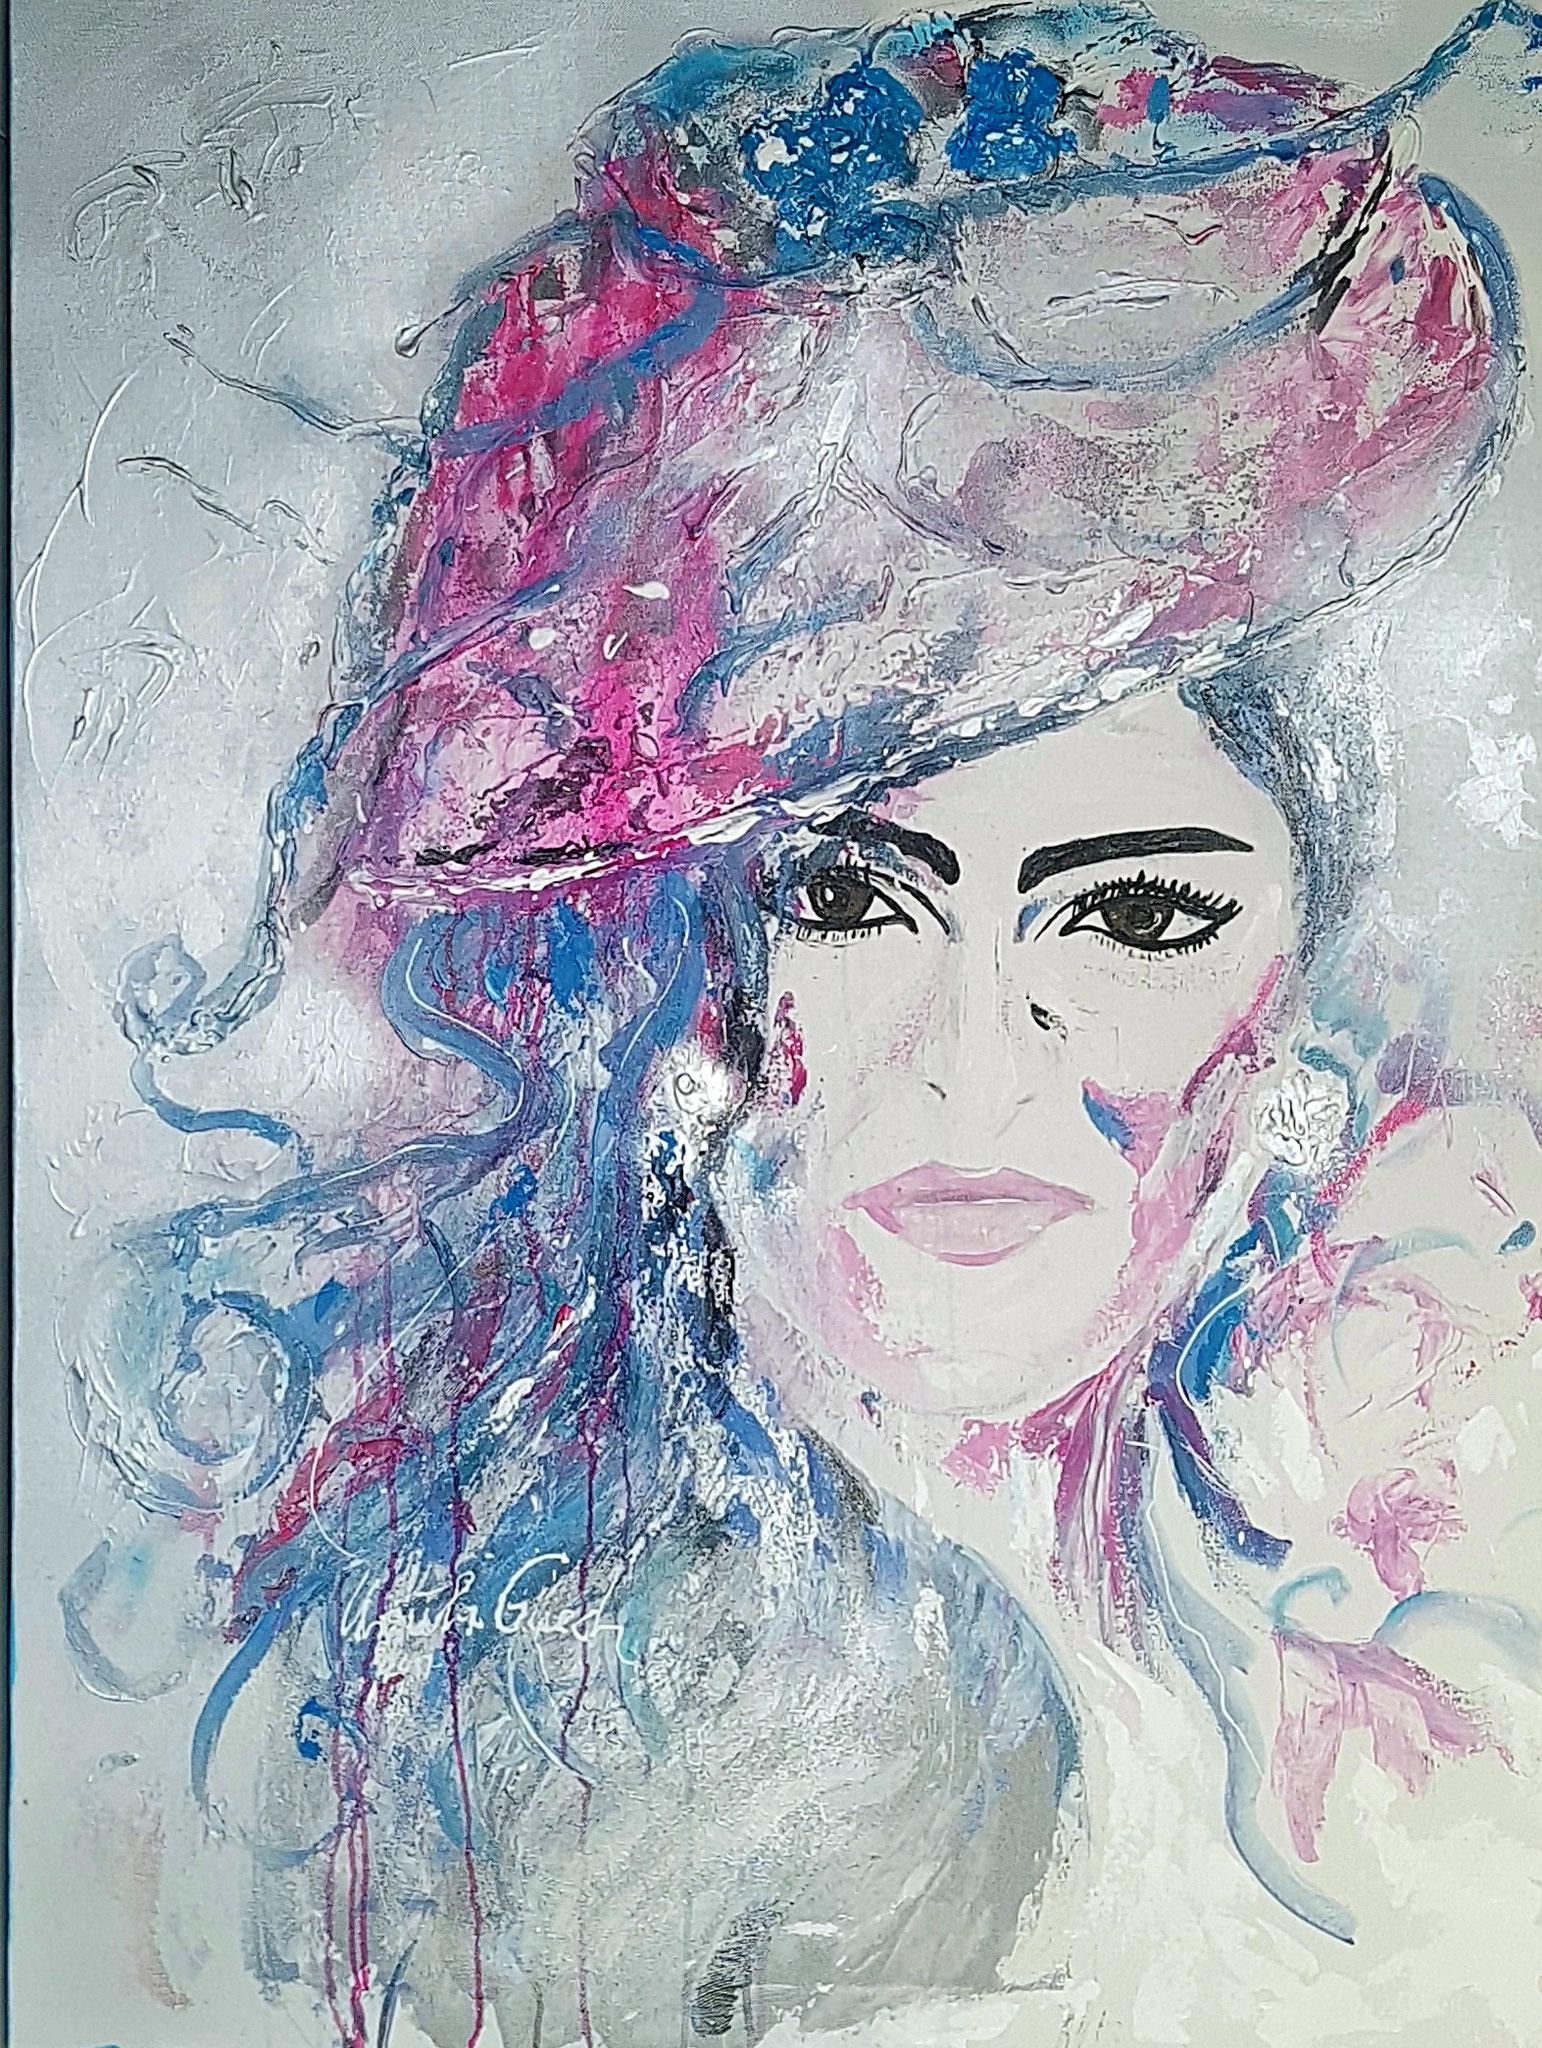 Princess Ameerah Al Taweel von  Saudi-Arabien (Technik: Acryl/Mixed Media auf Leinwand 90 X 120 cm)